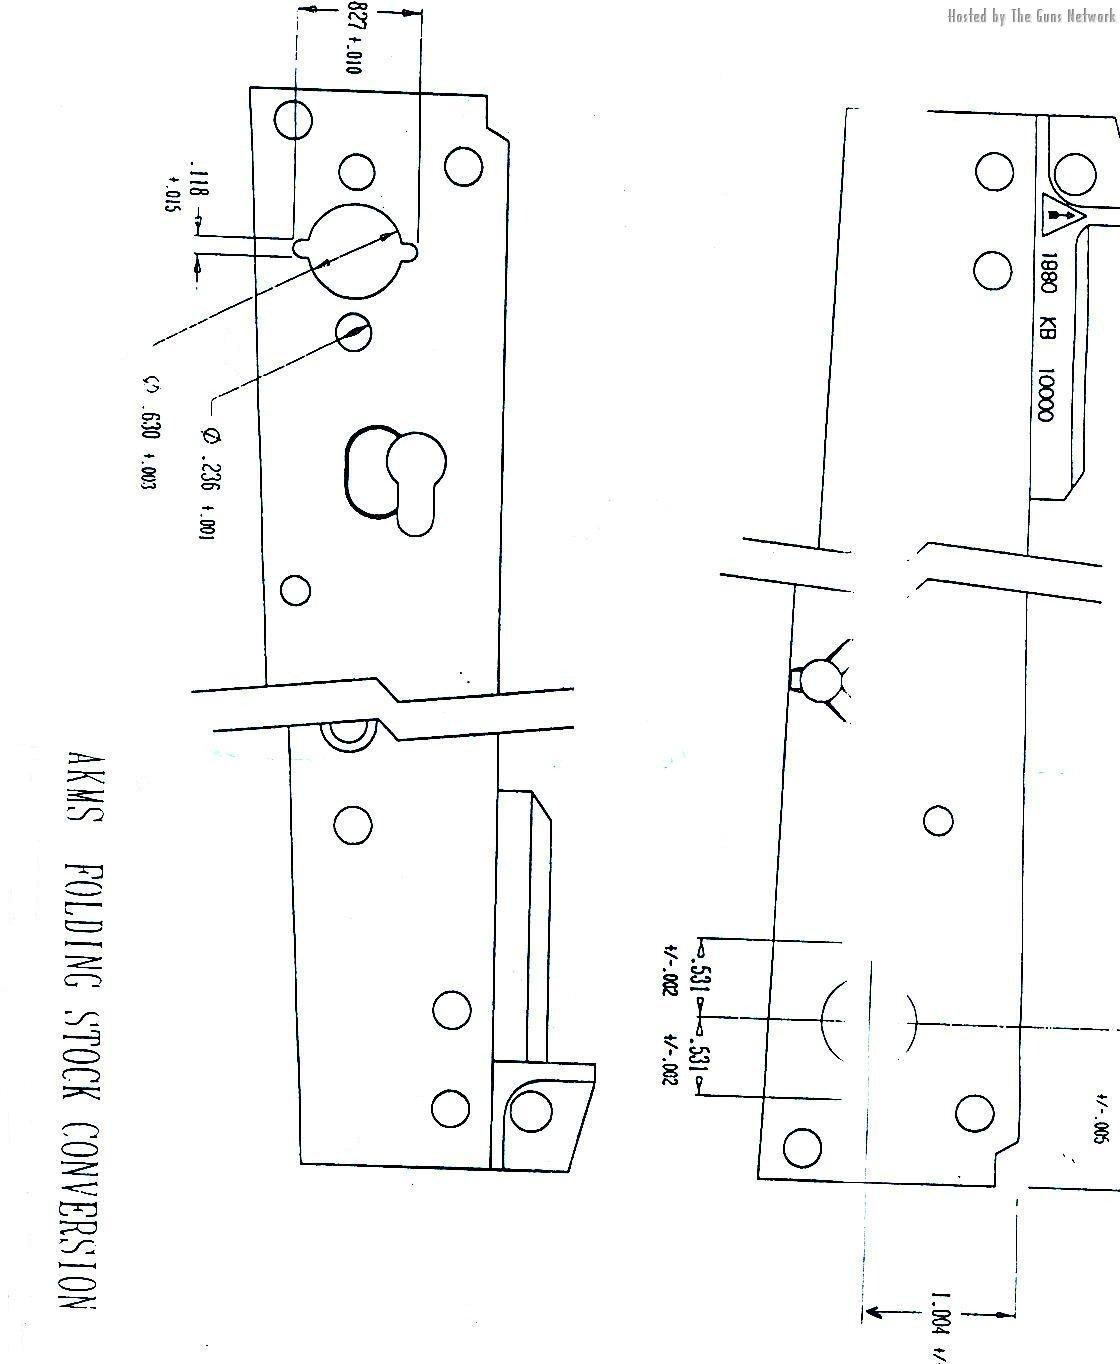 Printable Ak 47 Receiver Template Index Of Cdn 29 1994 341